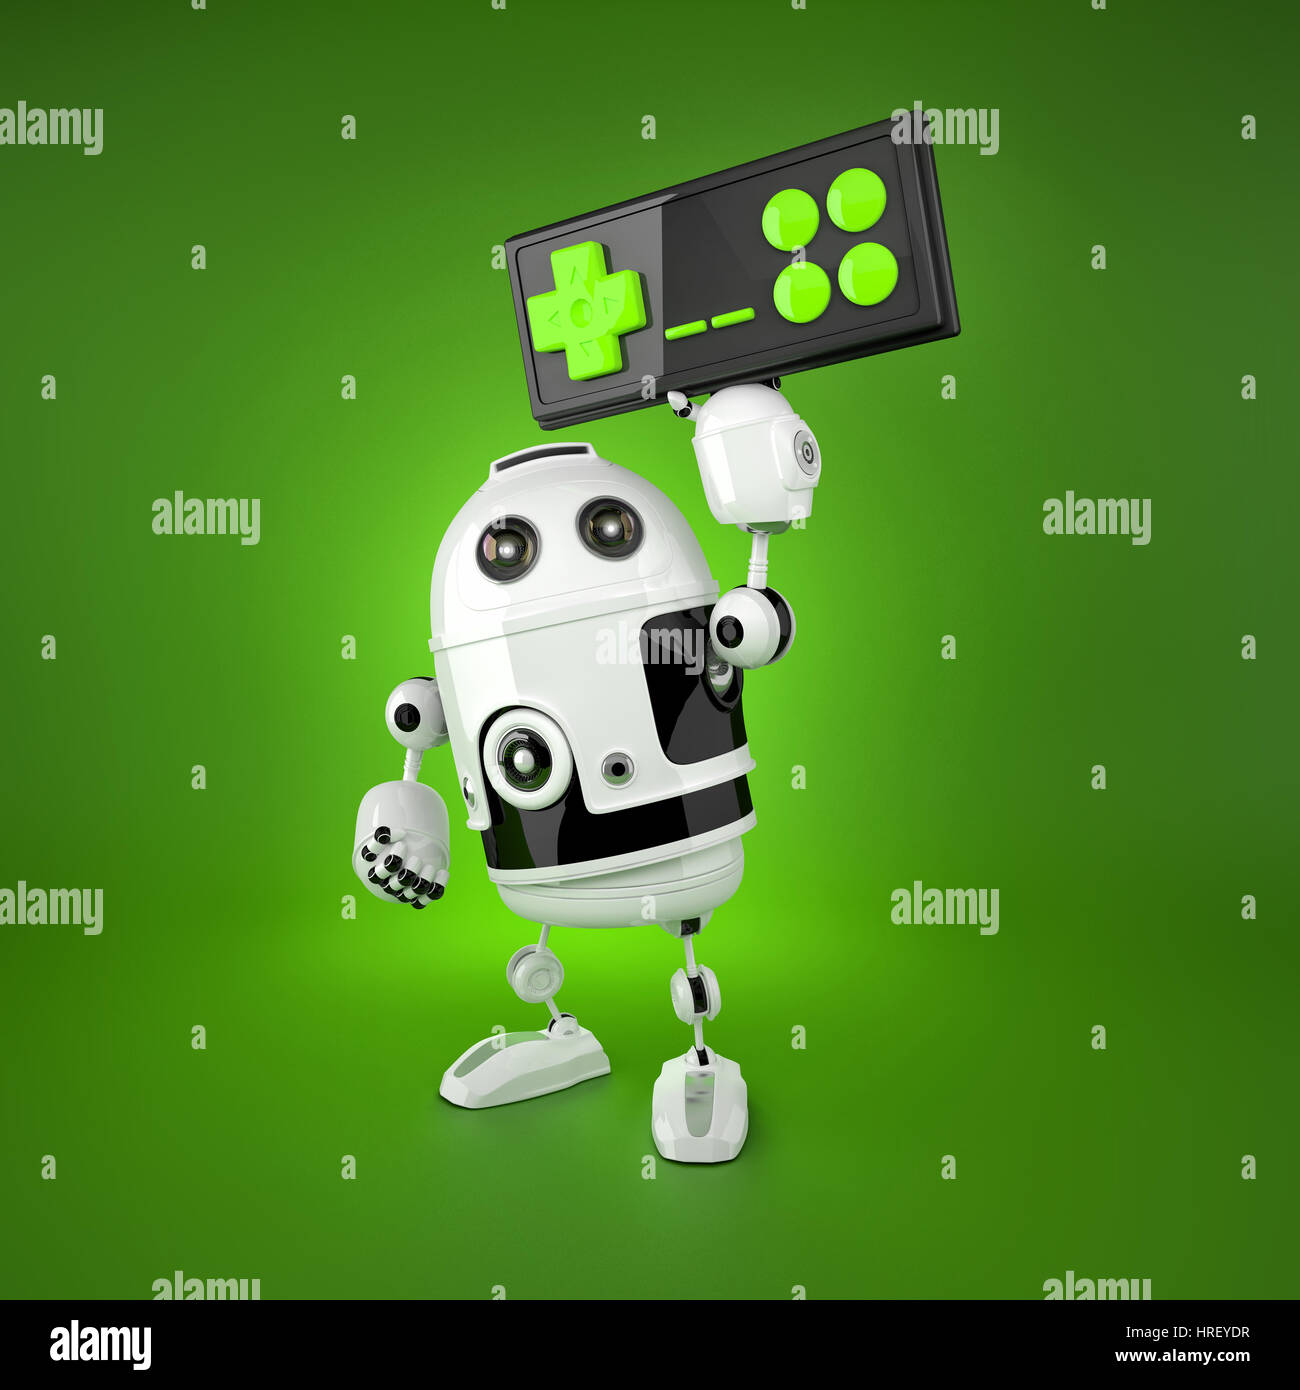 Robot Android avec une manette sans fil. Isolated on white Banque D'Images